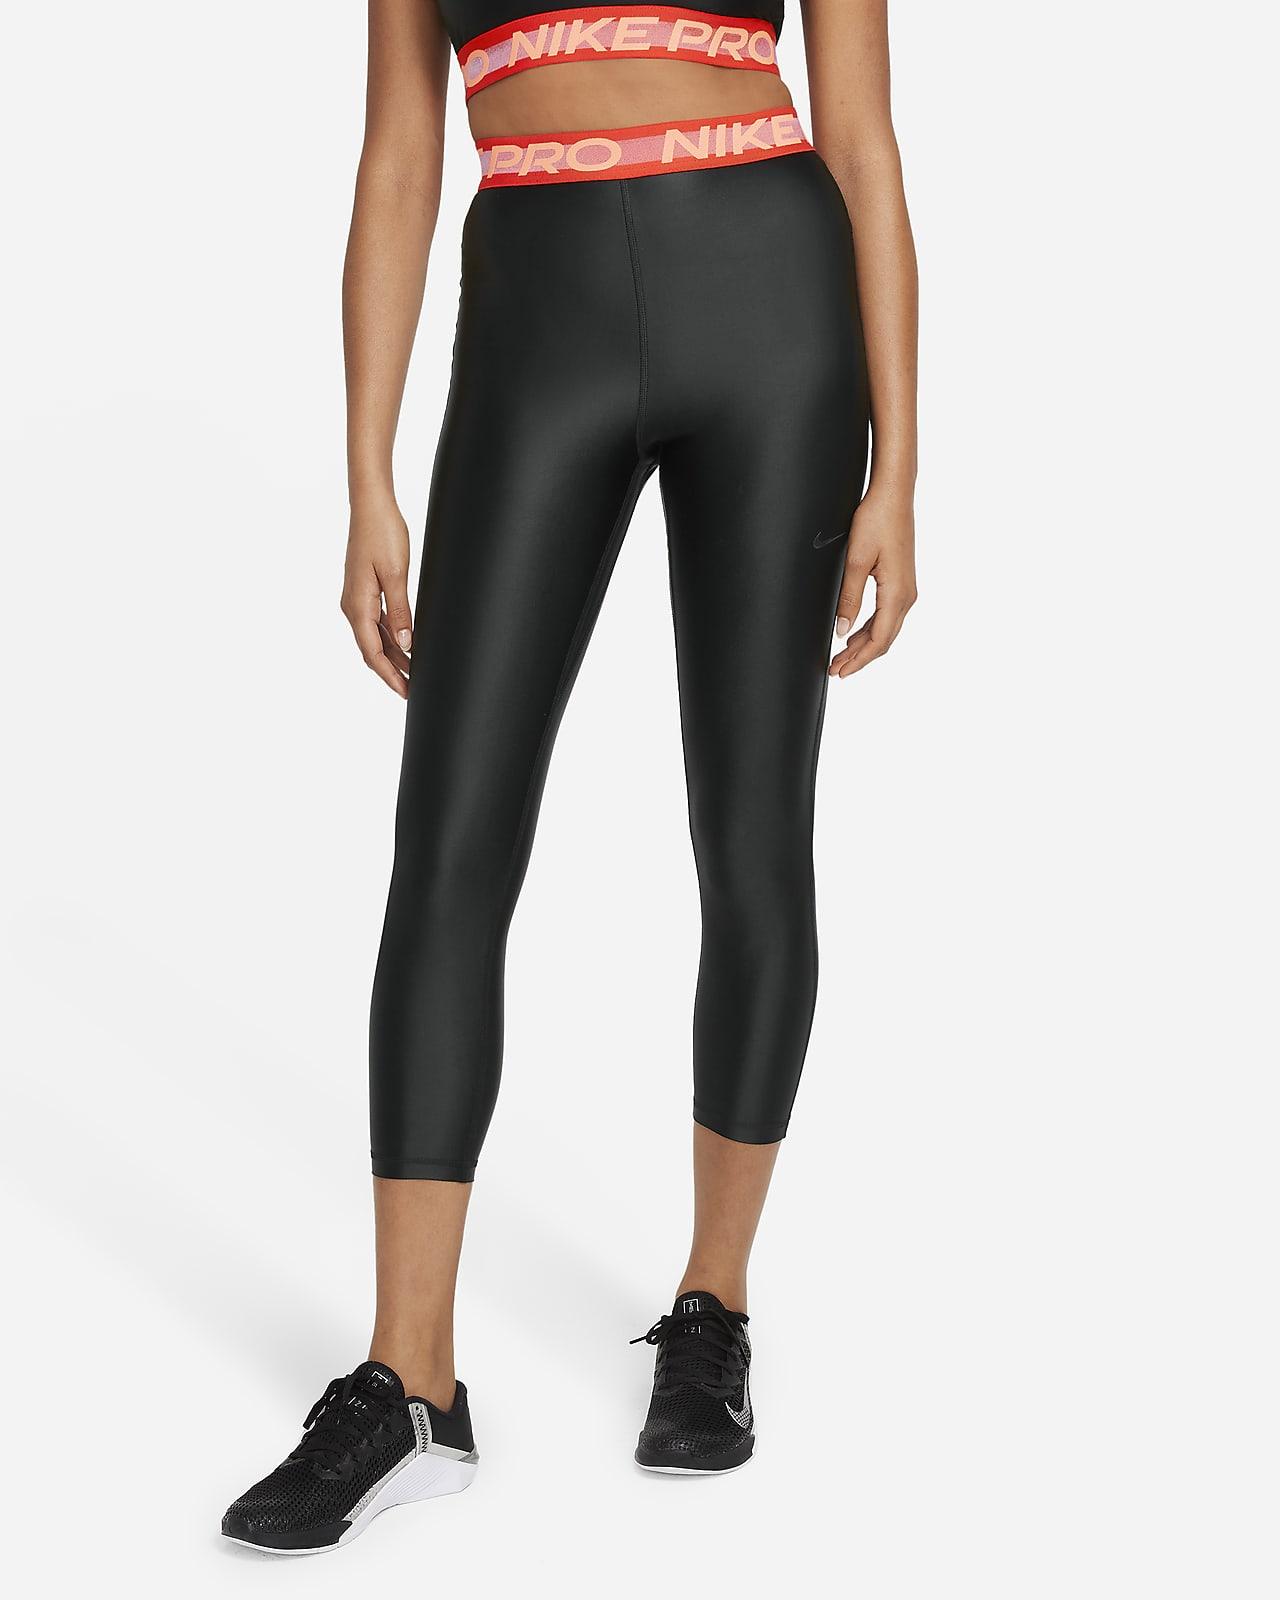 Leggings de cintura alta 7/8 para mujer Nike Pro